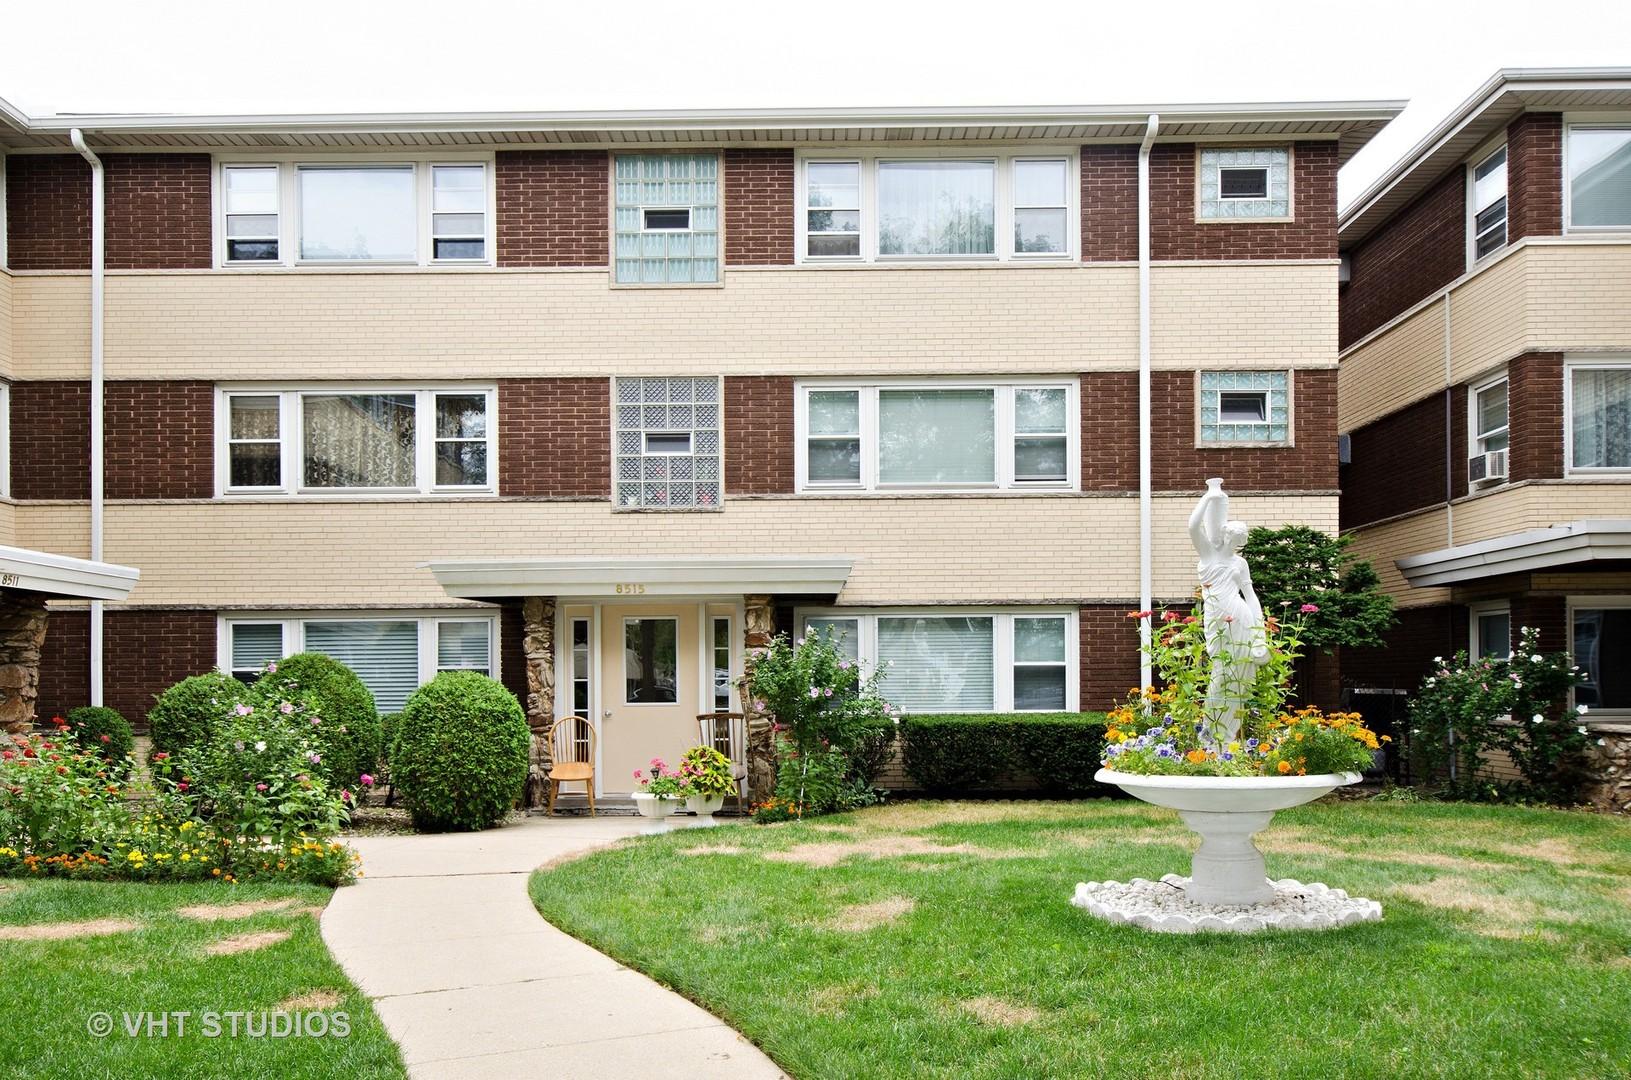 8515 W Bryn Mawr Ave Unit 1E, Chicago IL 60631